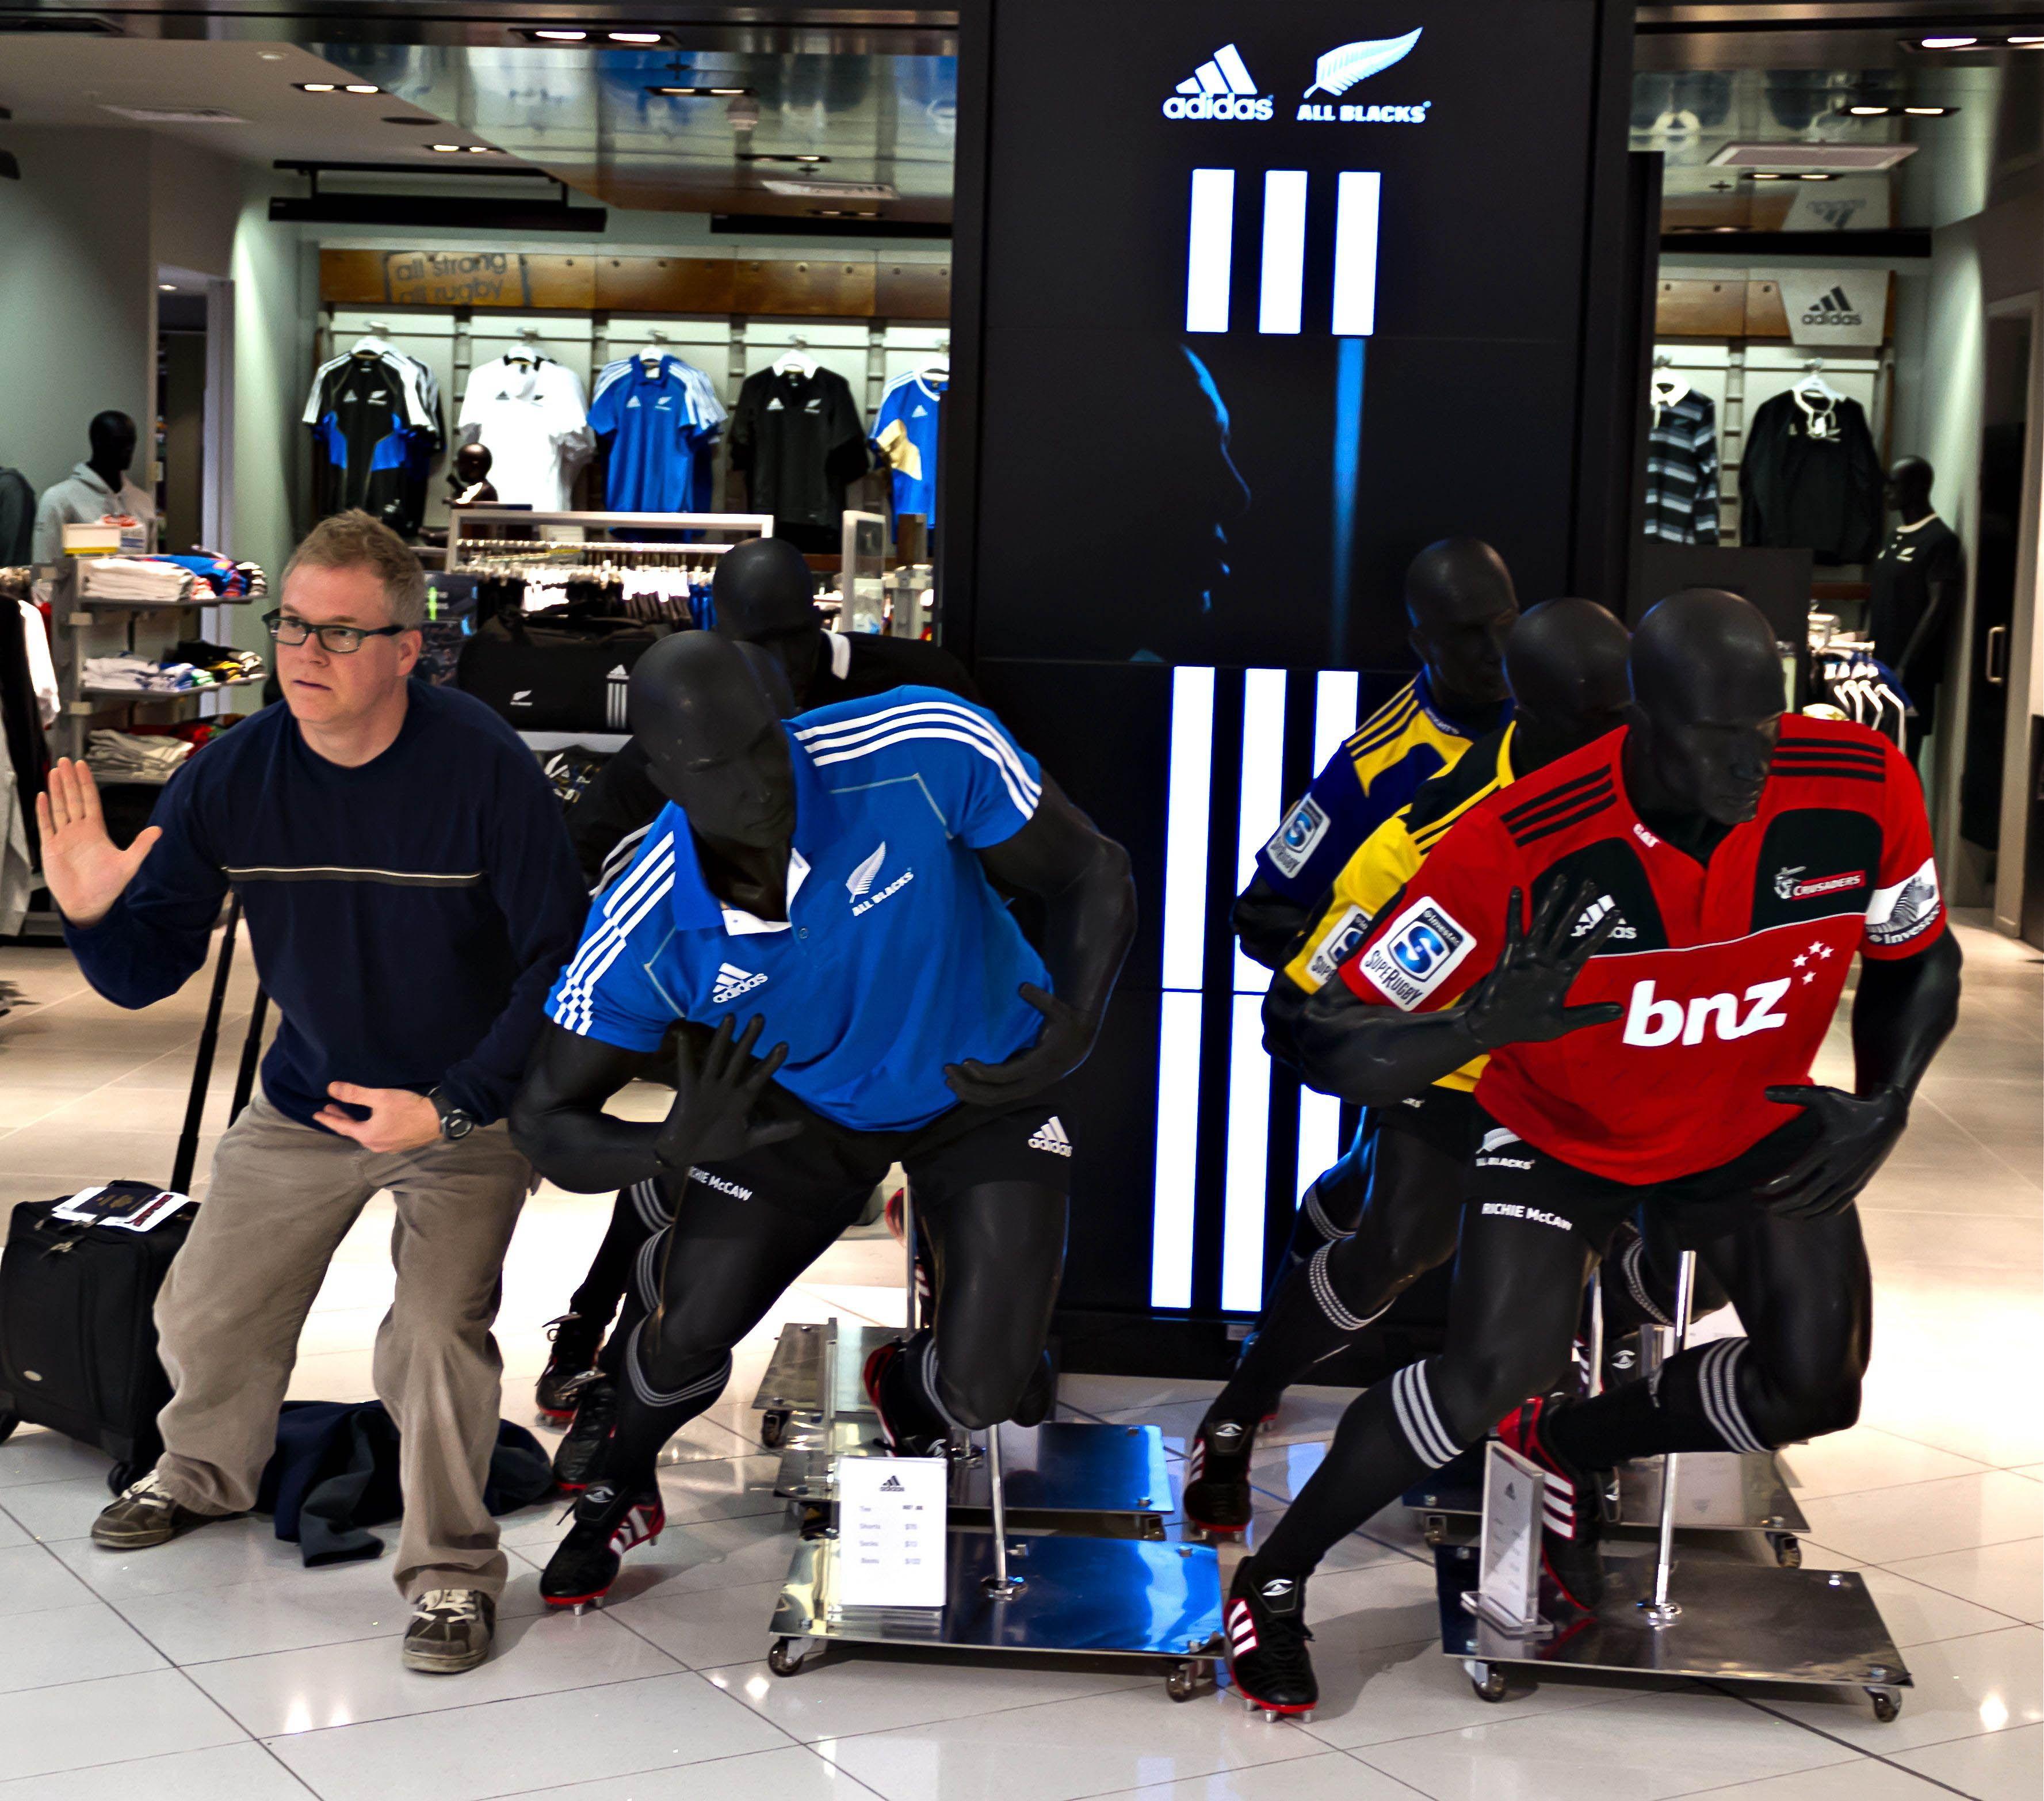 Auckland New Zealand Mannequins w Brian Franklin